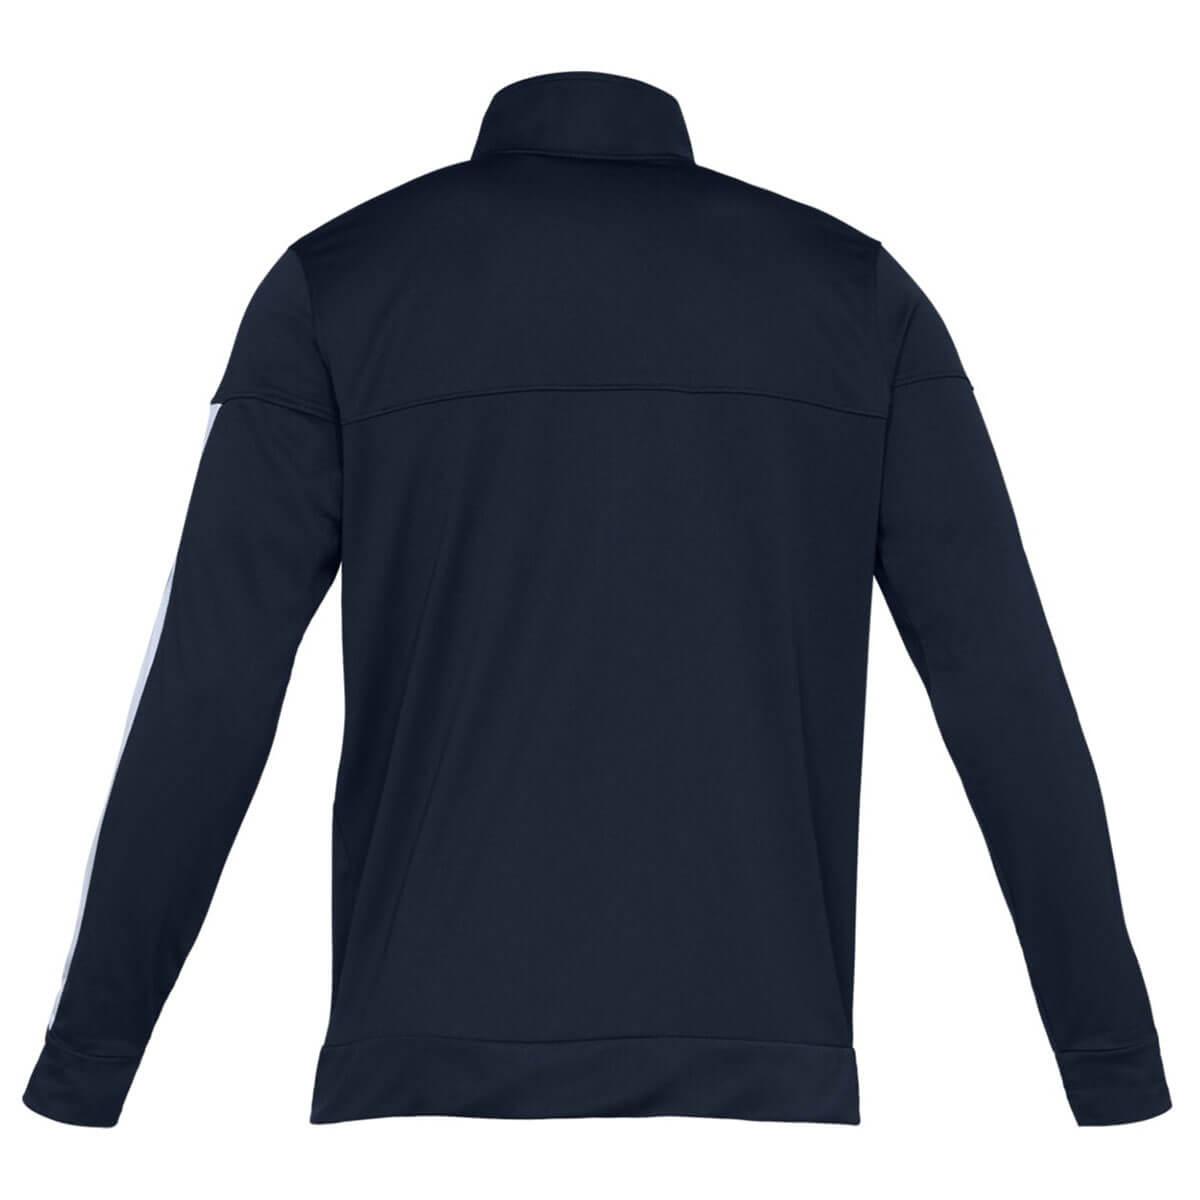 Under-Armour-Mens-2019-Sportstyle-Pique-Stretch-Quick-Dry-Wicking-Fleece-Jacket miniatura 5